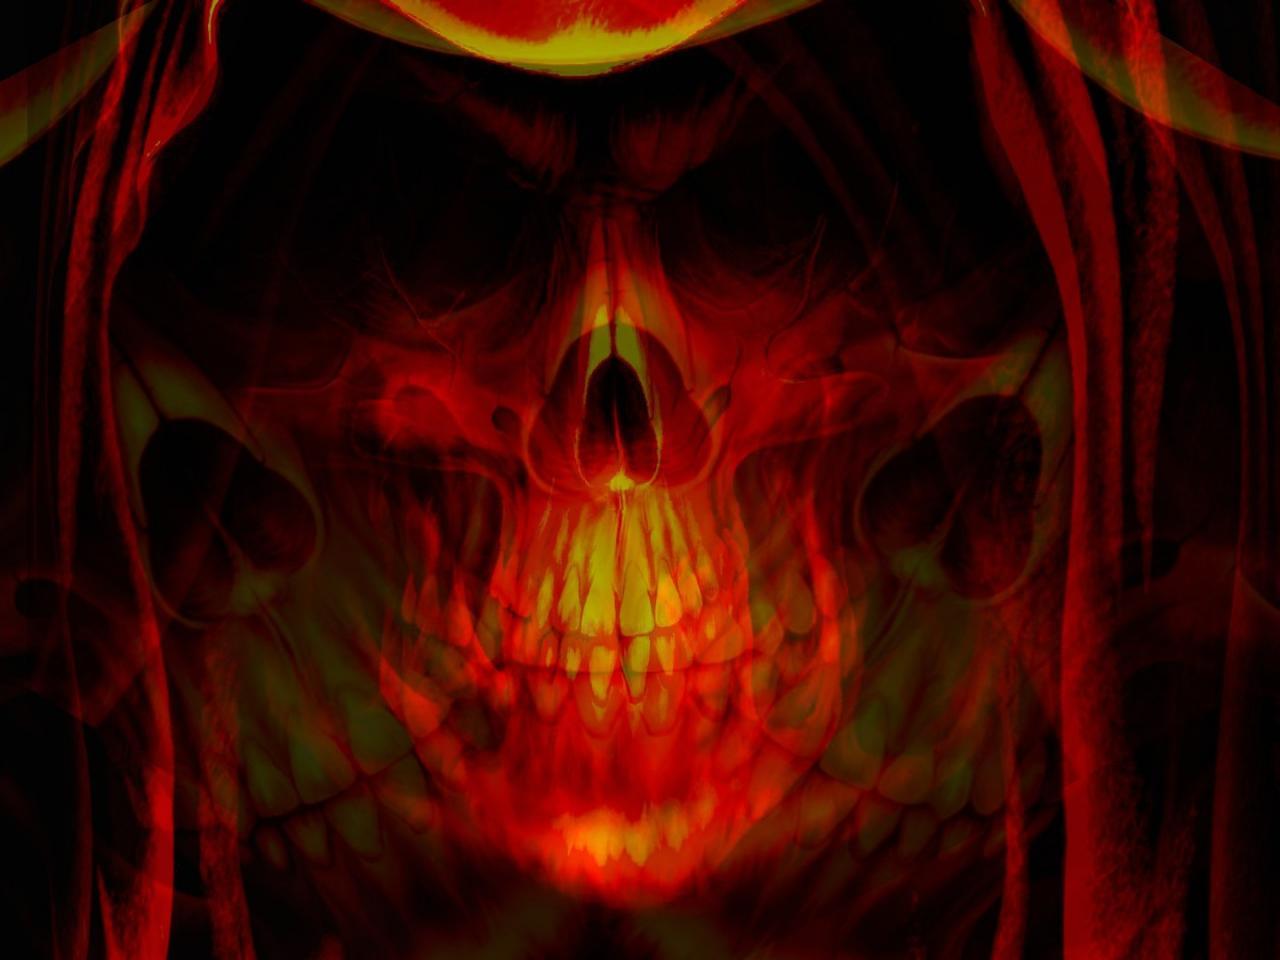 49 skull and flame wallpaper on wallpapersafari - Phone wallpapers fire ...